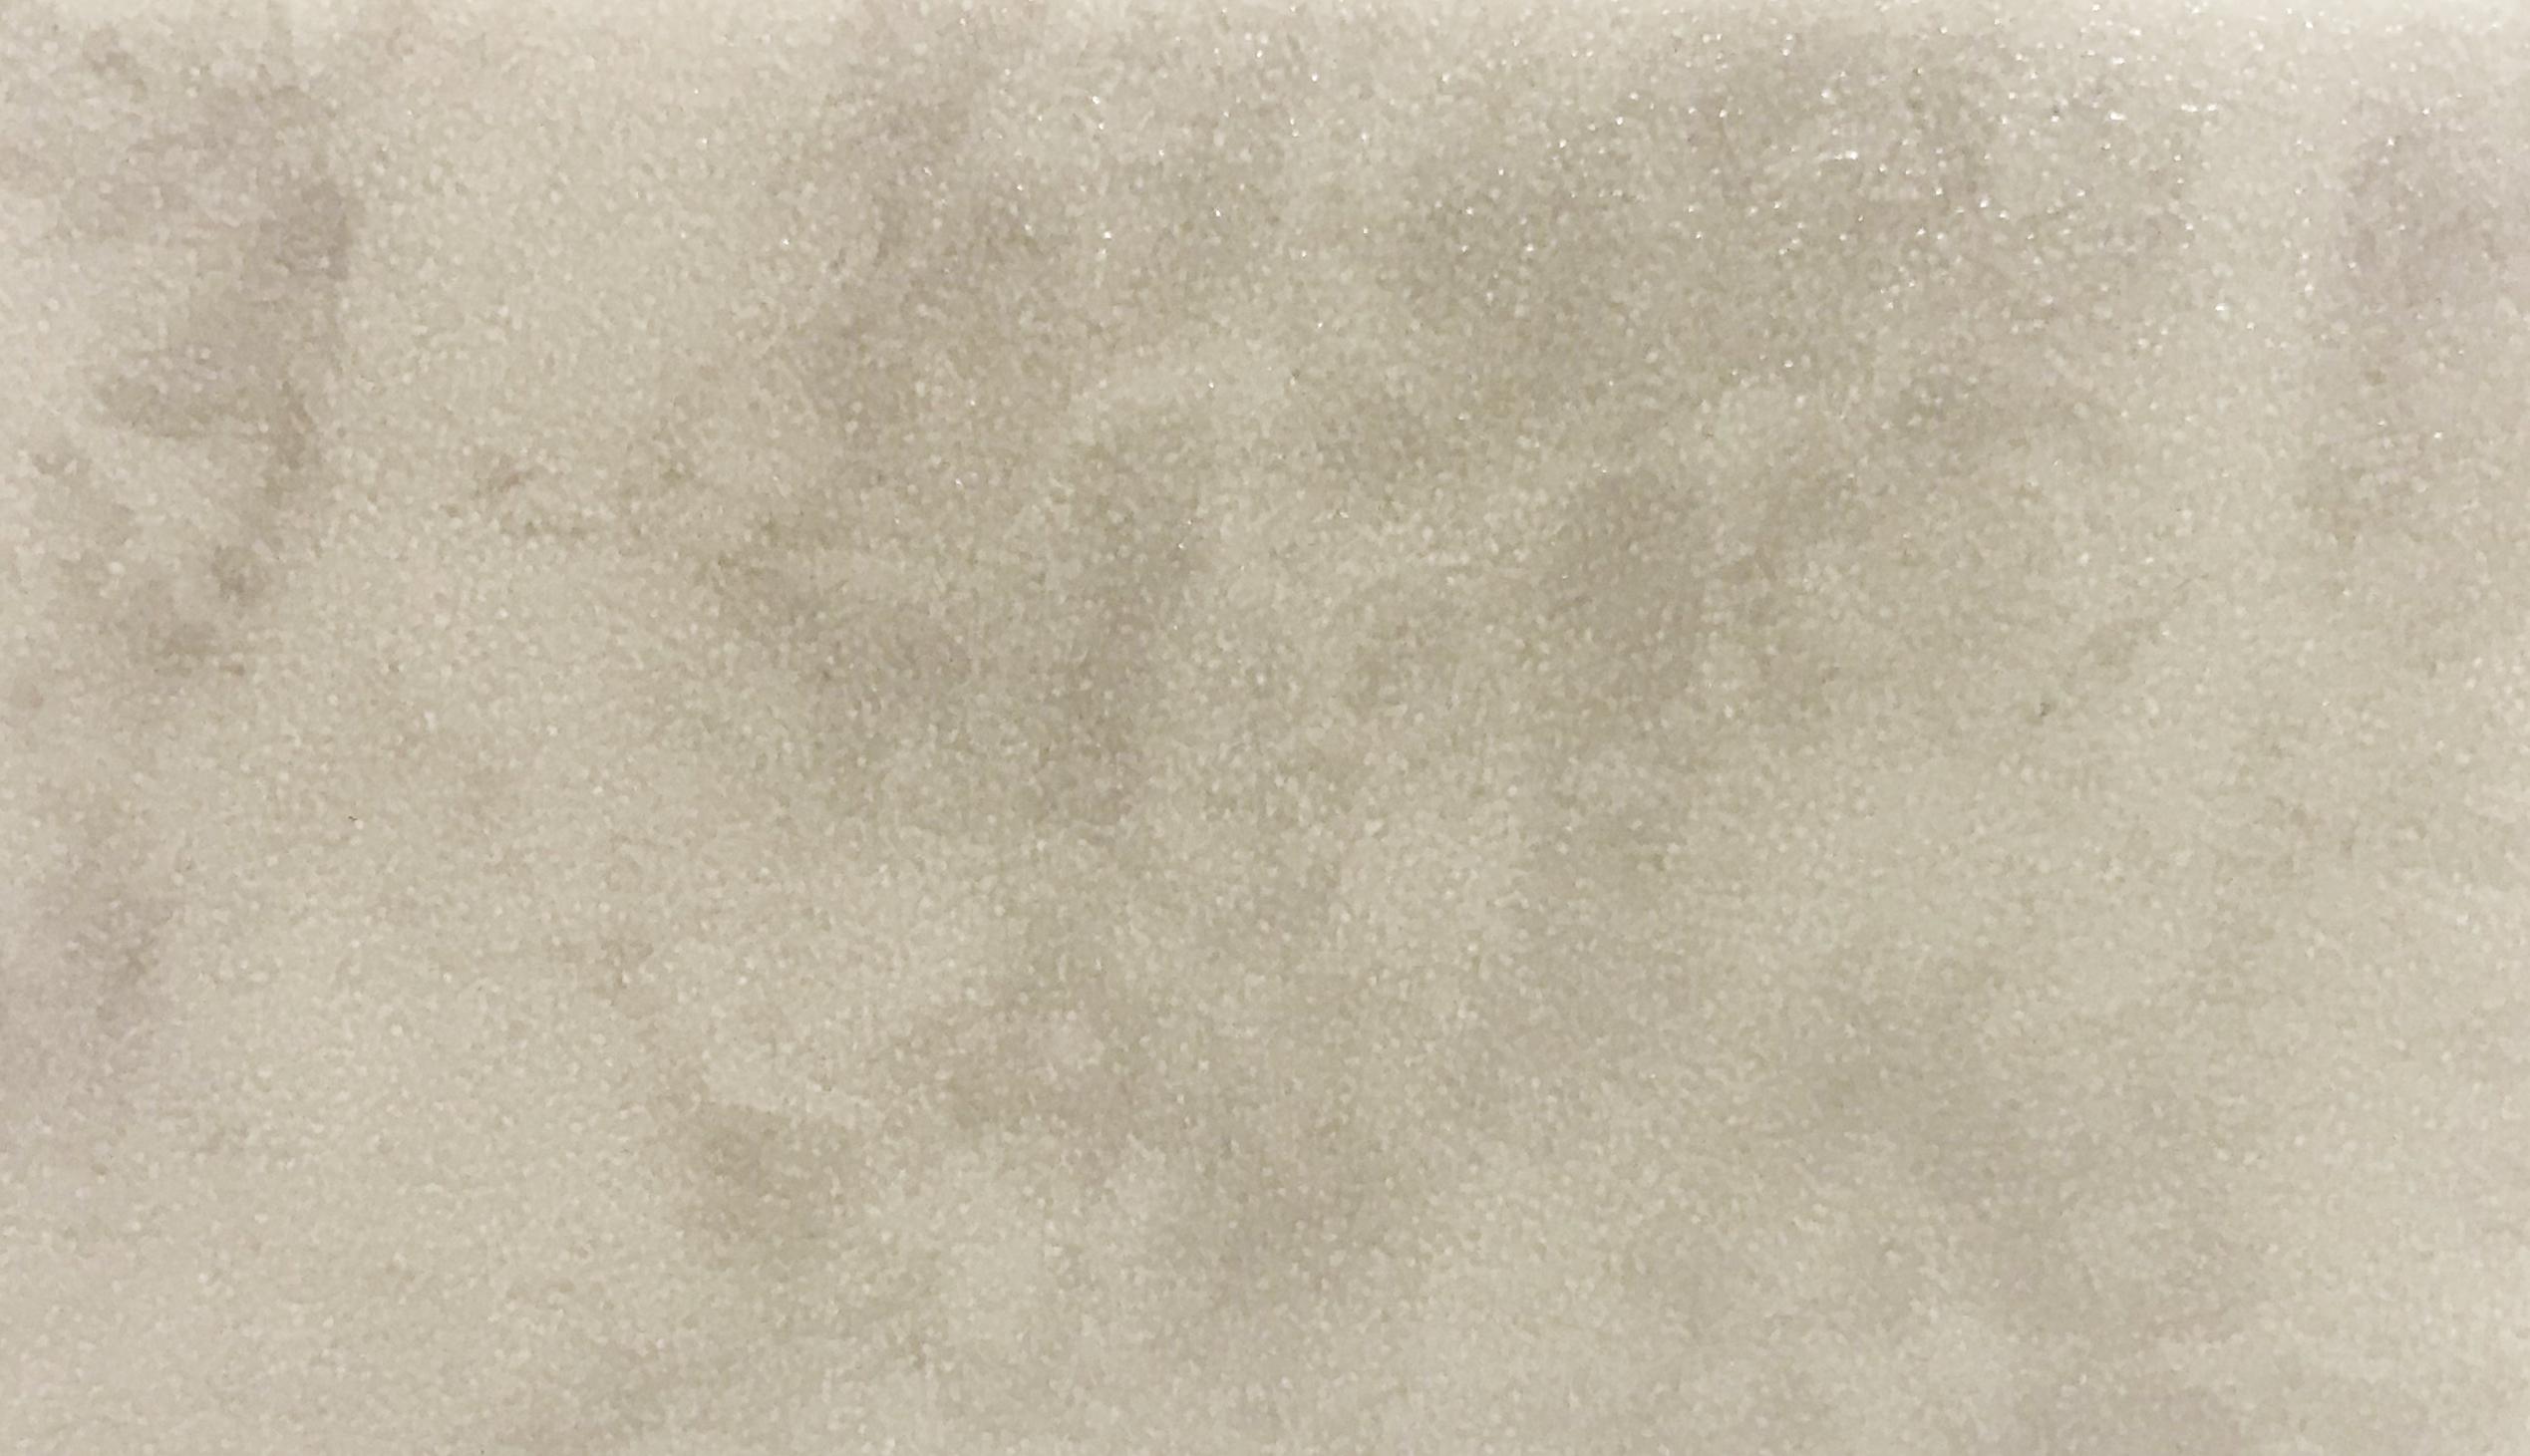 Vinyl-Grabo-Silver-Knight-Rock-White-Sand